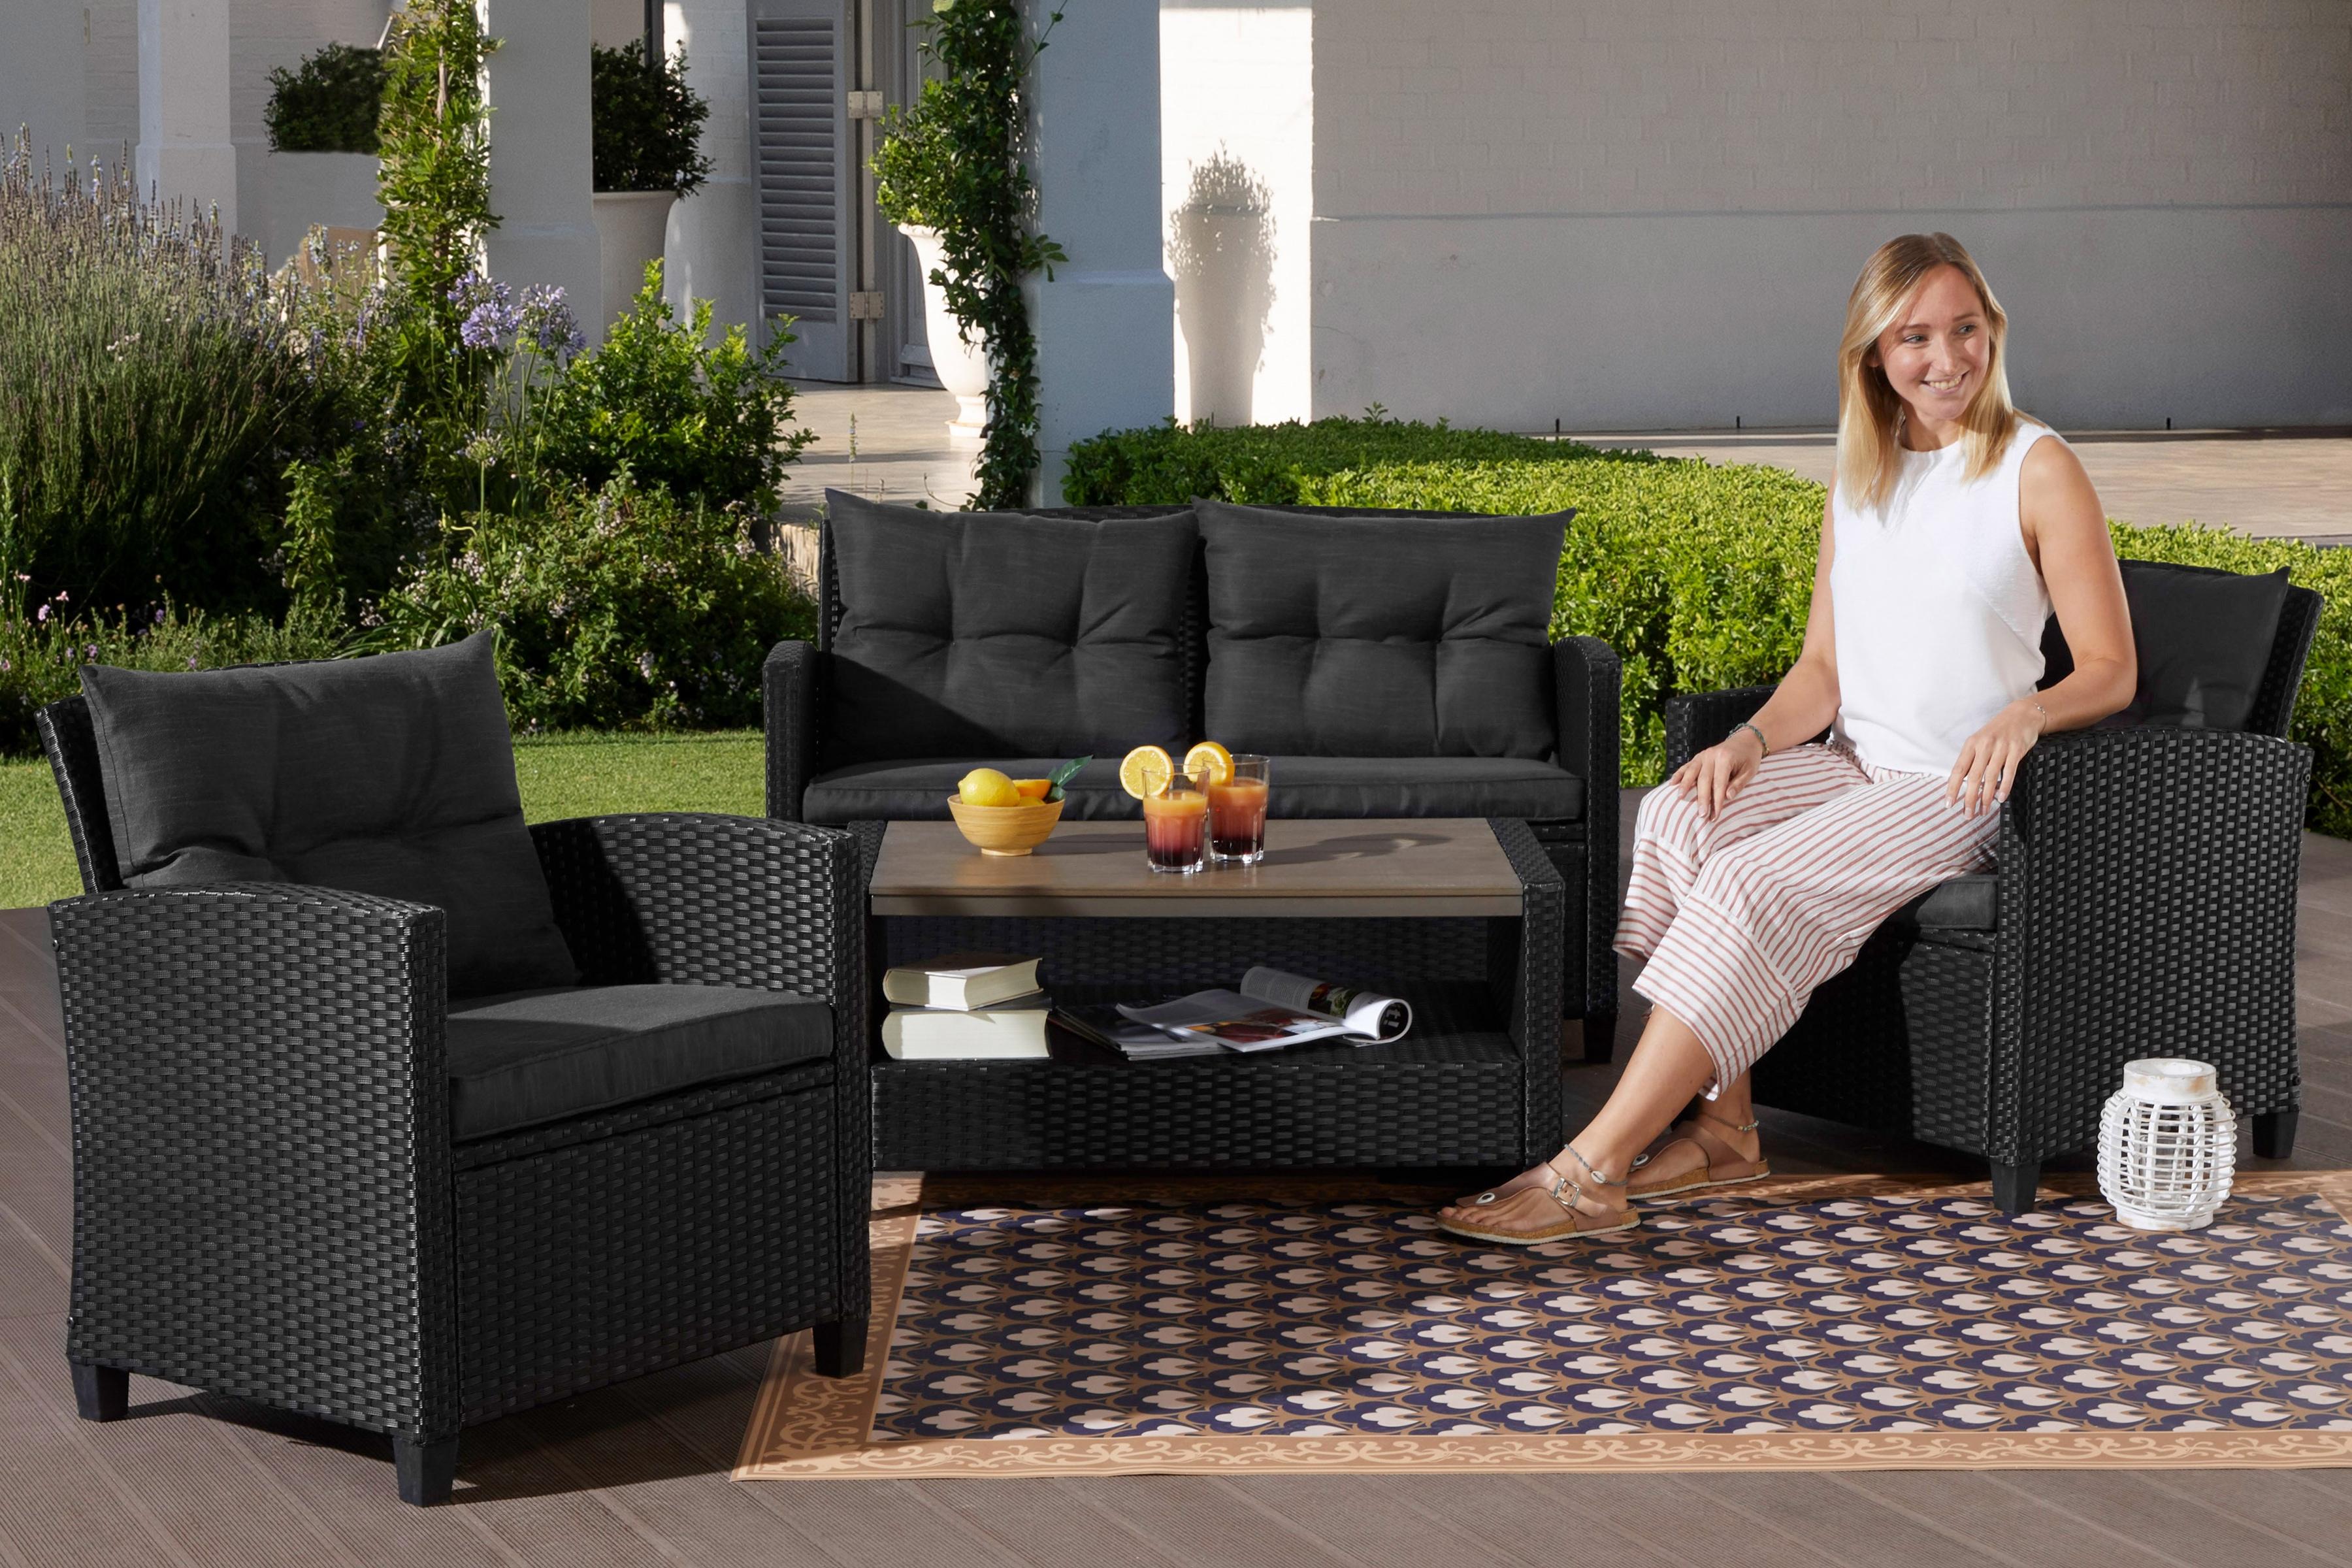 KONIFERA Gartenmöbelset St Tropez 11-tlg 2er Sofa 2 Sessel Tisch 90x55 cm Polyrattan